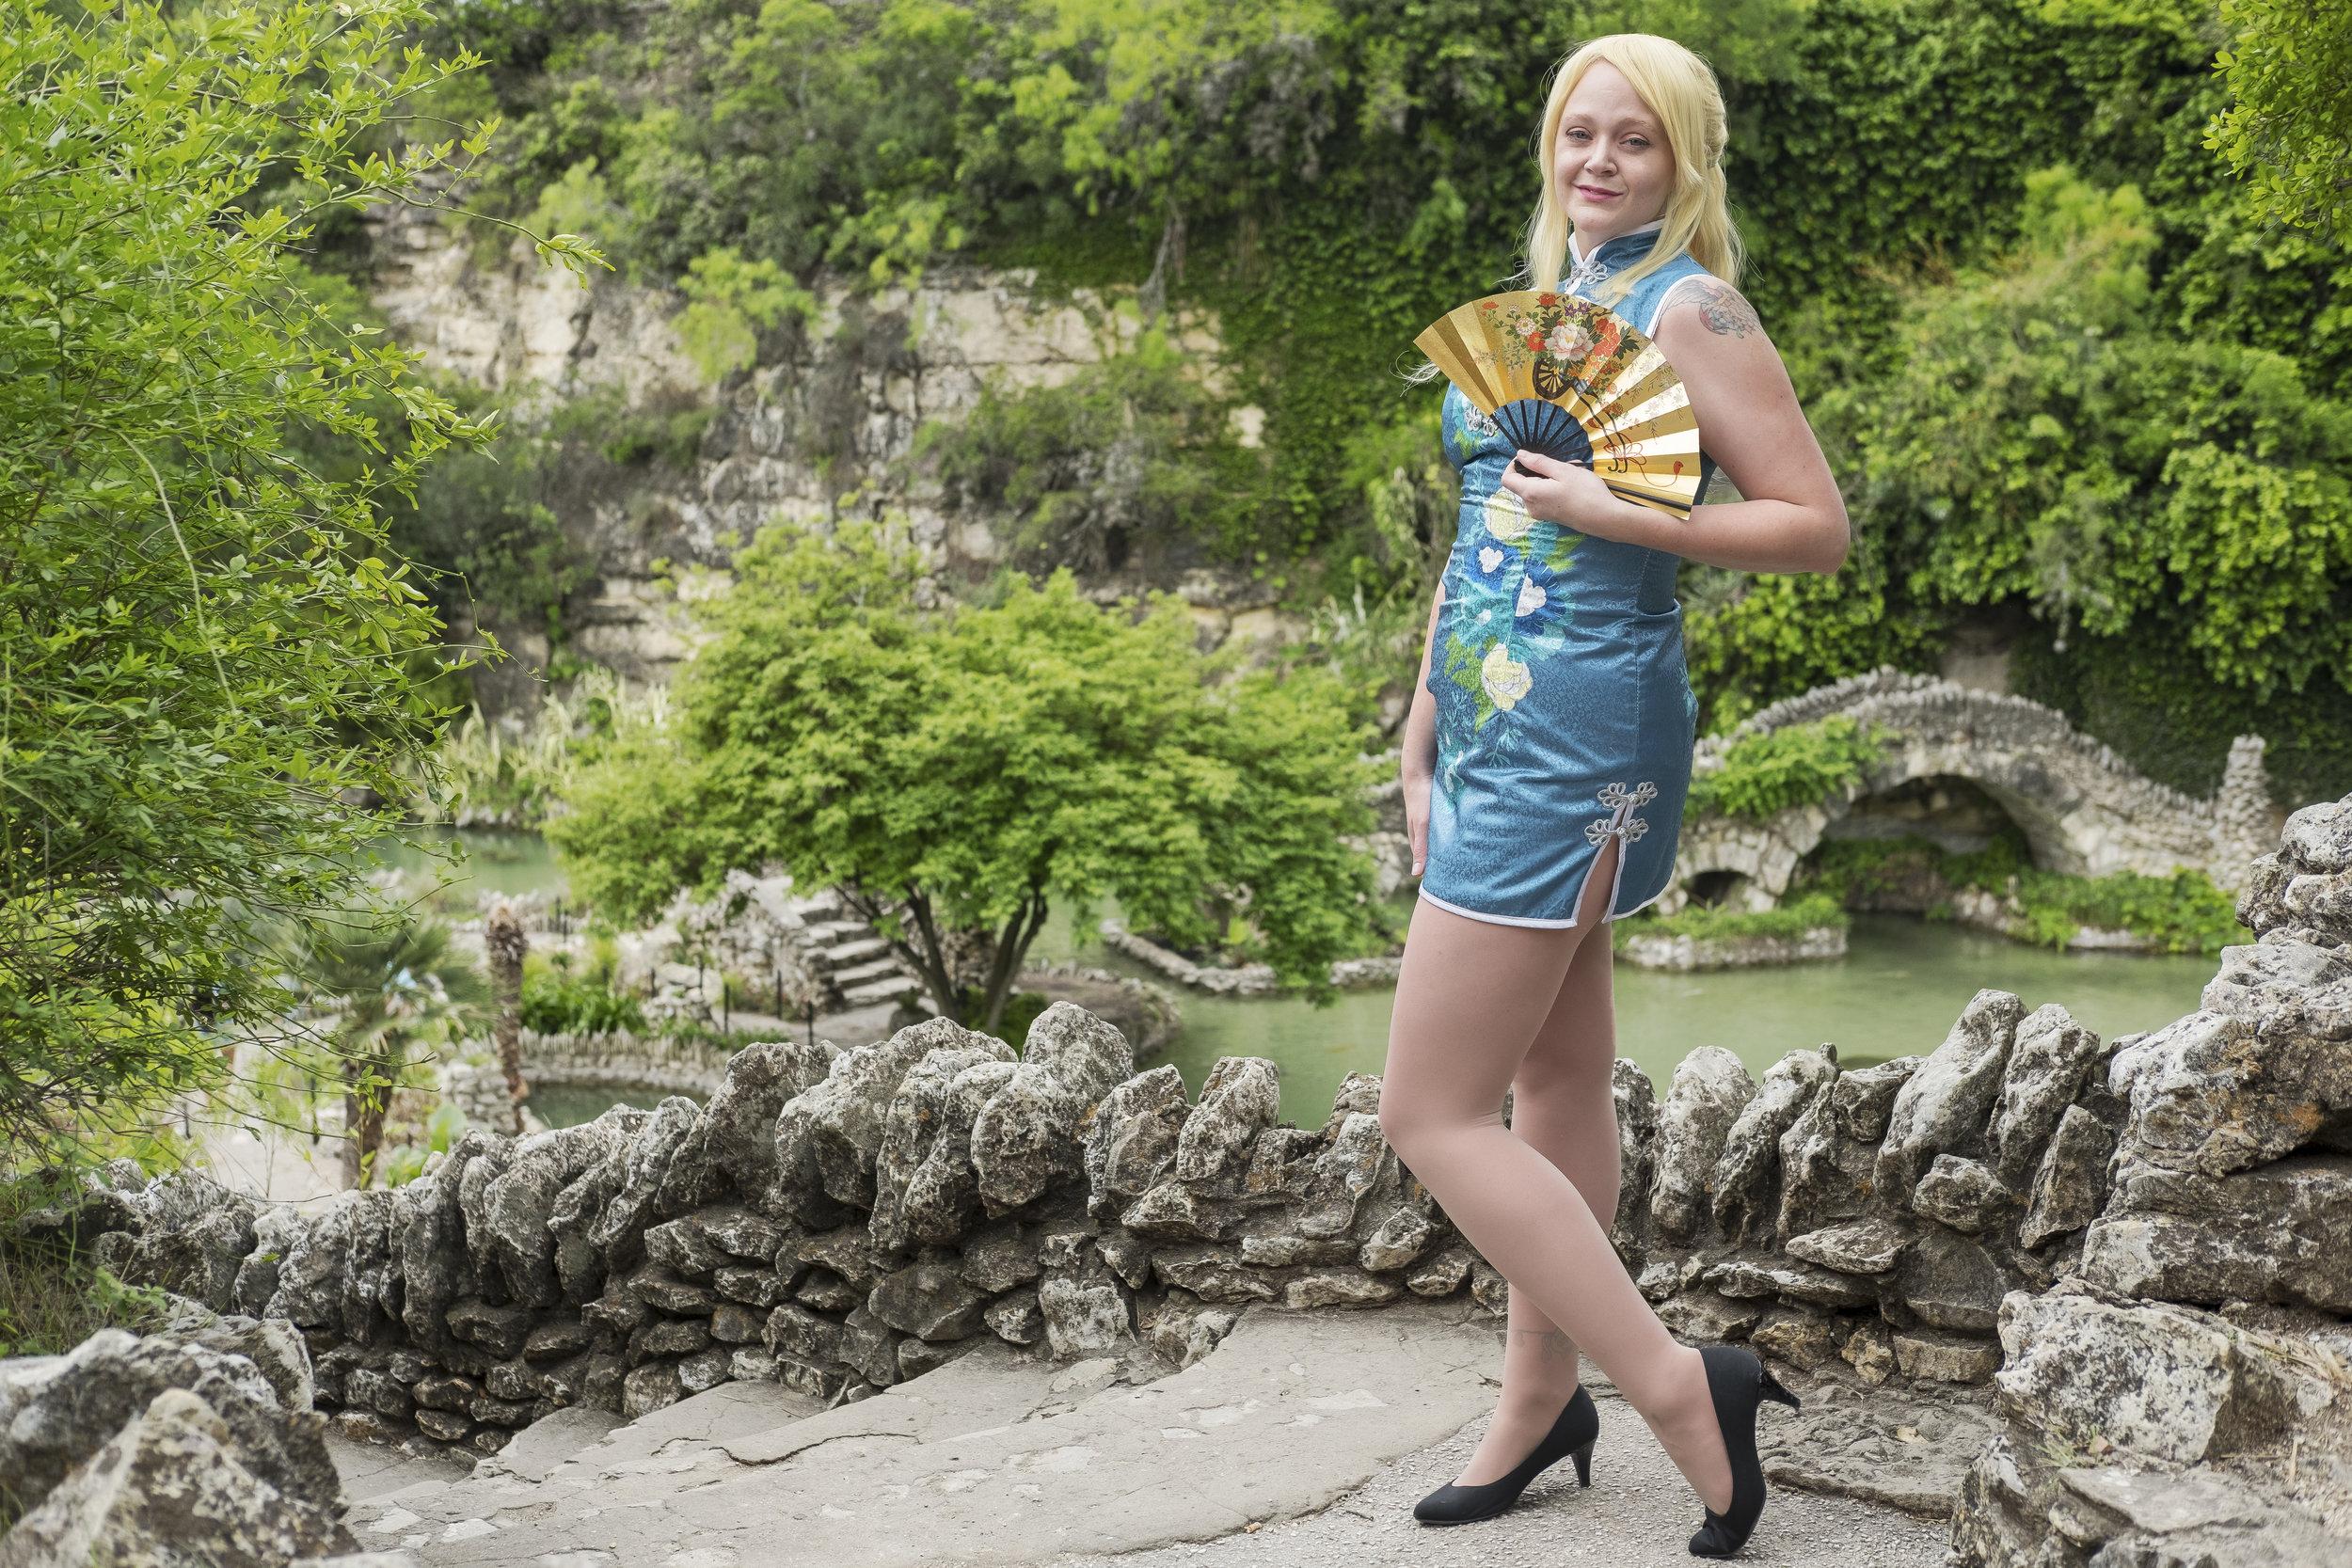 Allybelle Cosplay in Eli Ayase cosplay at the San Antonio Japanese Tea Gardens